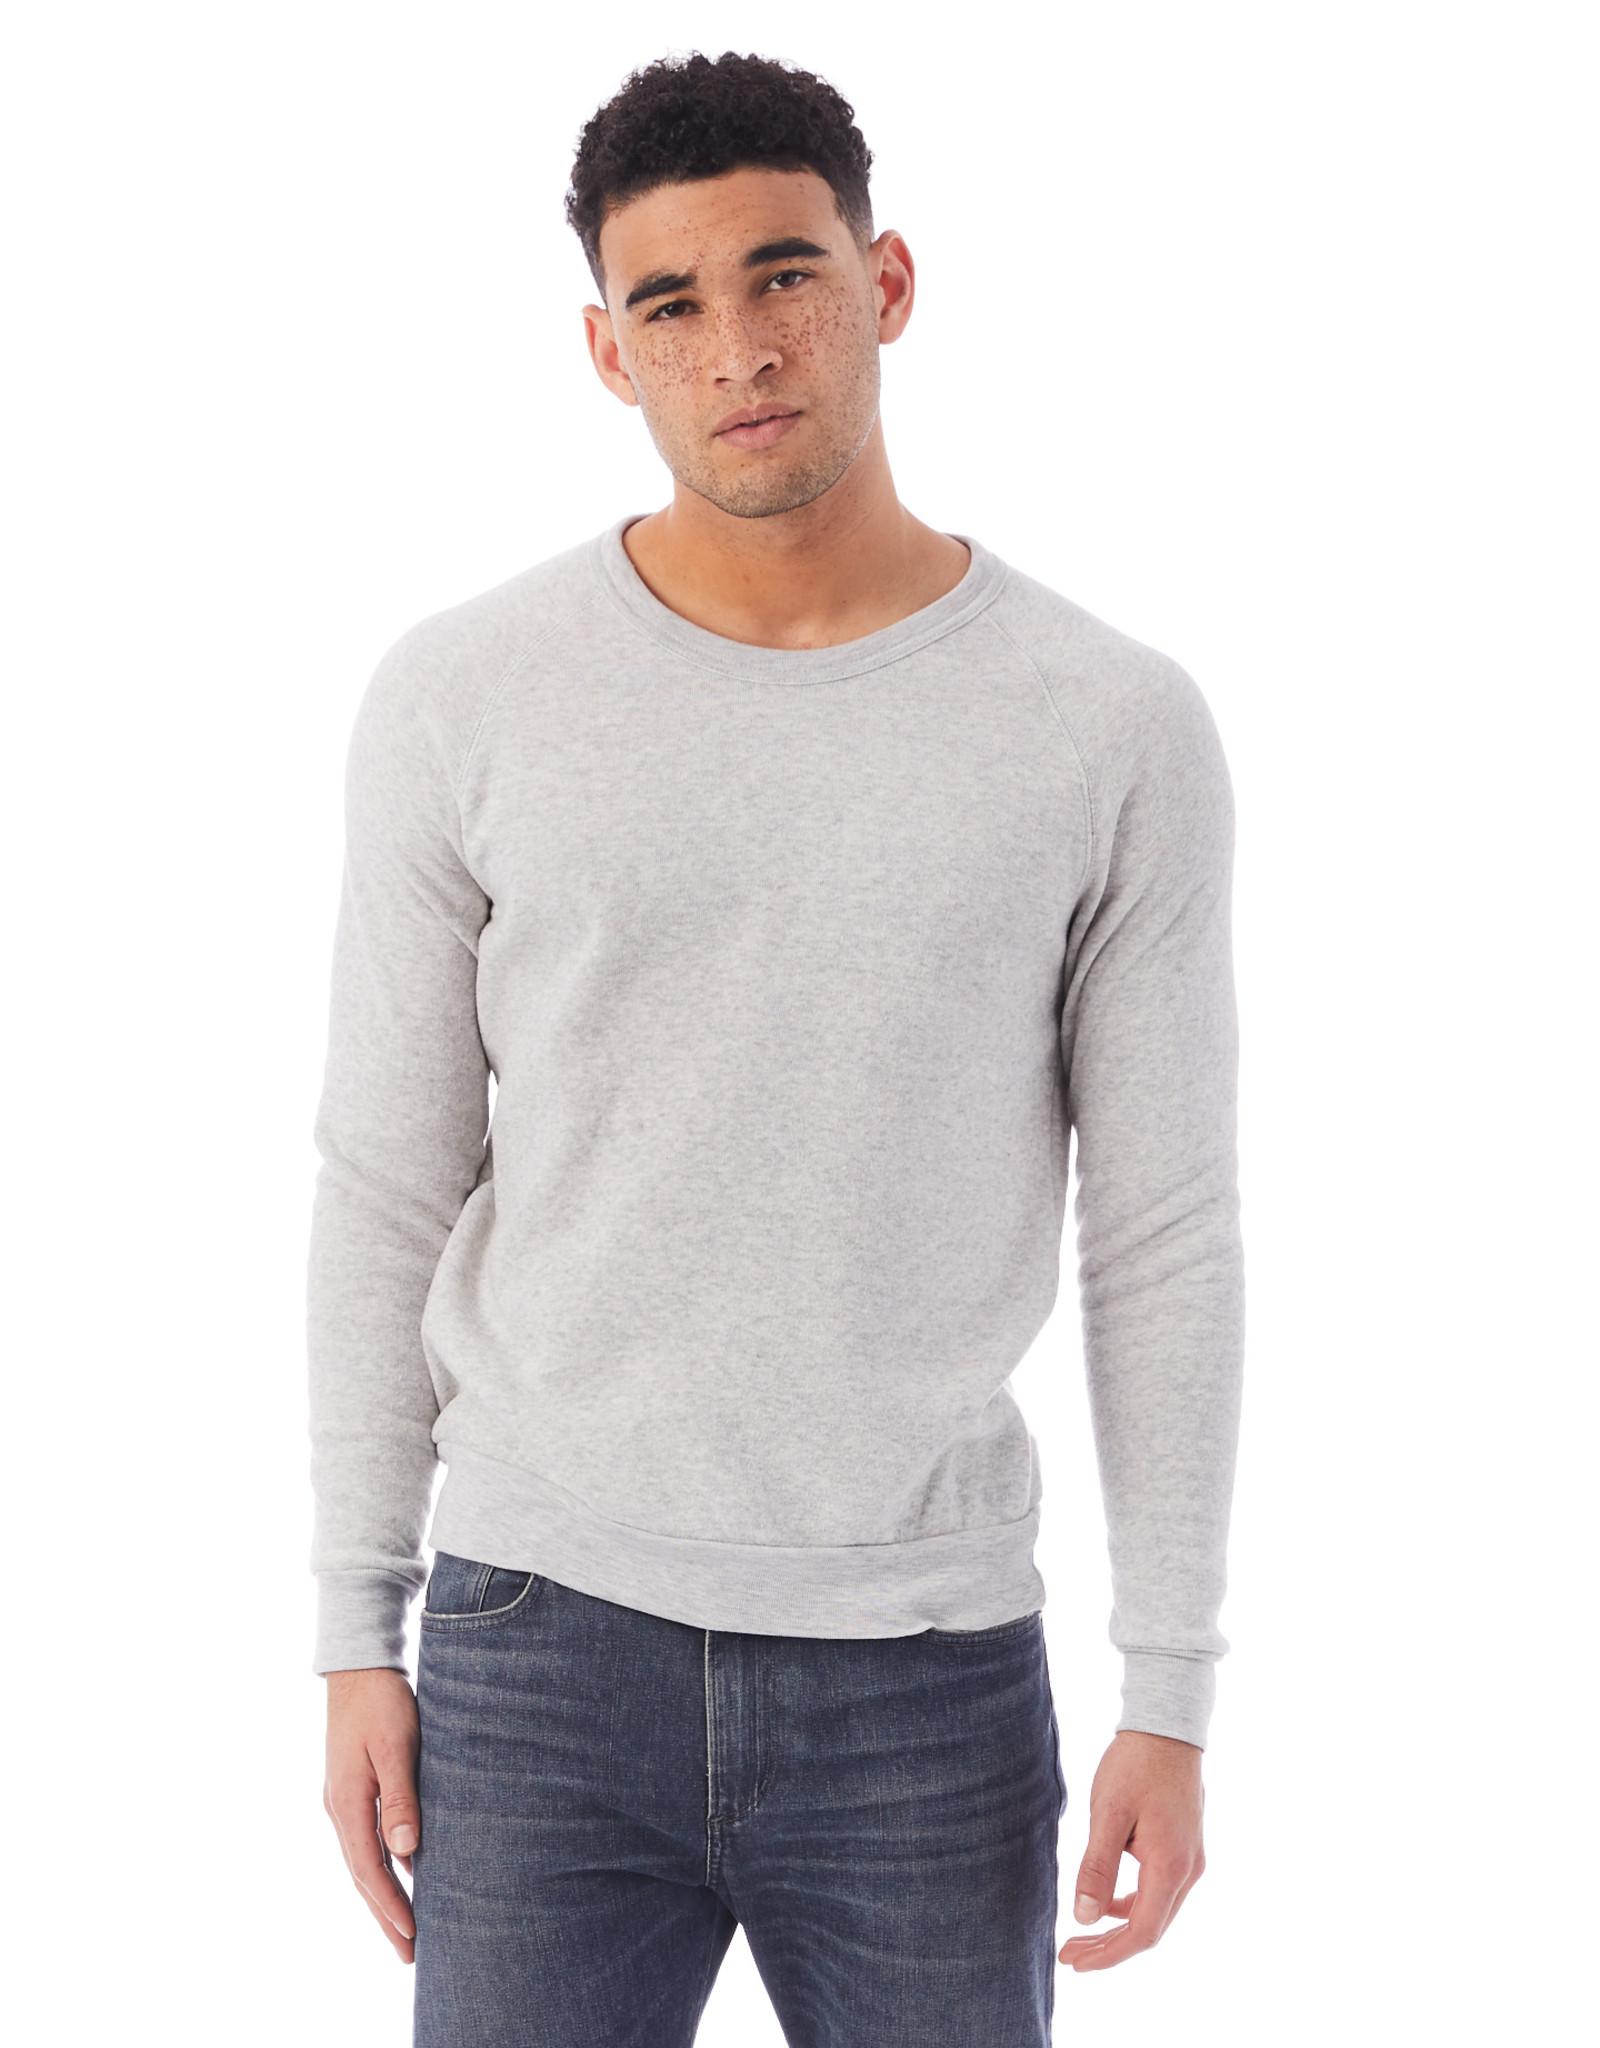 Alternative Apparel Champ Eco-Fleece Sweatshirt